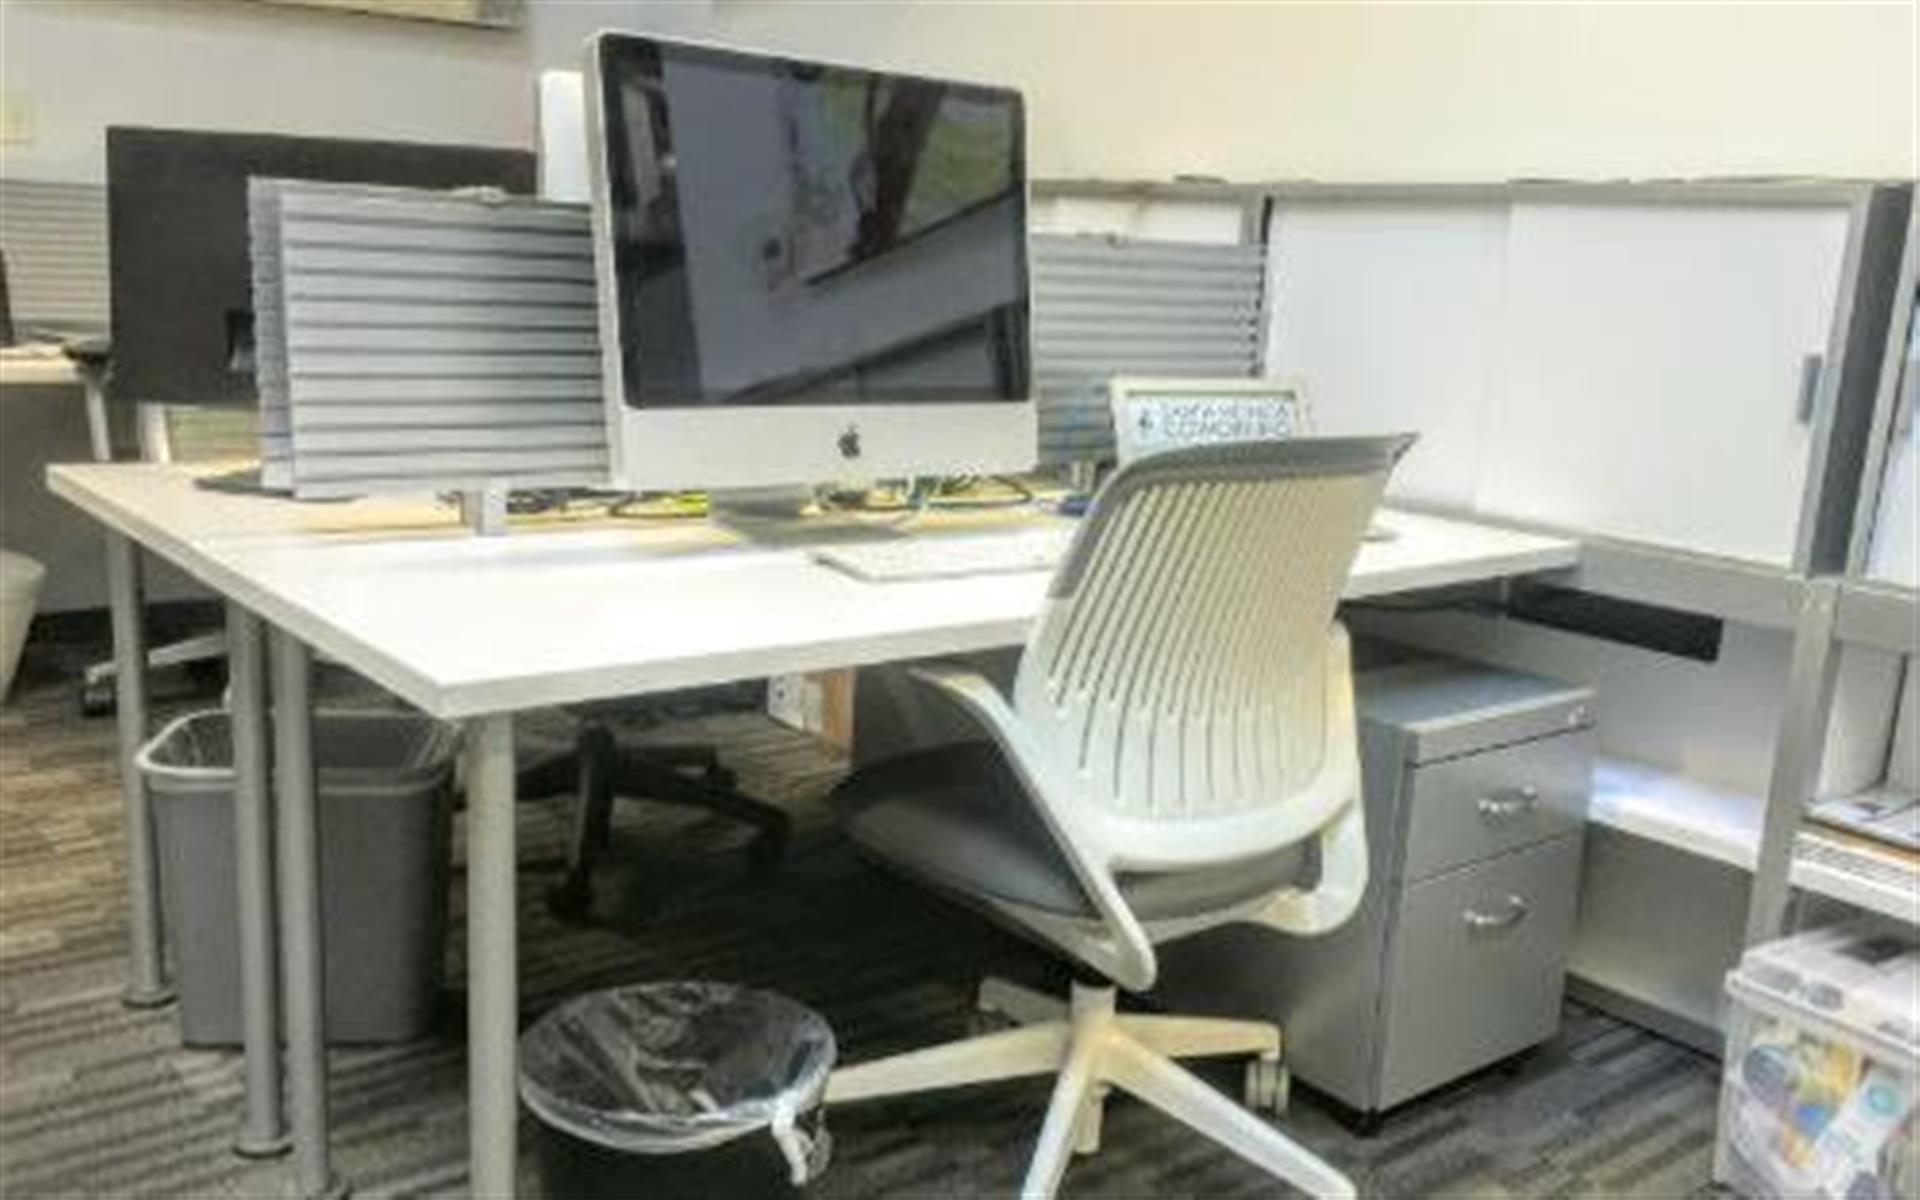 SAMOCO: Santa Monica Coworking - Dedicated Desk